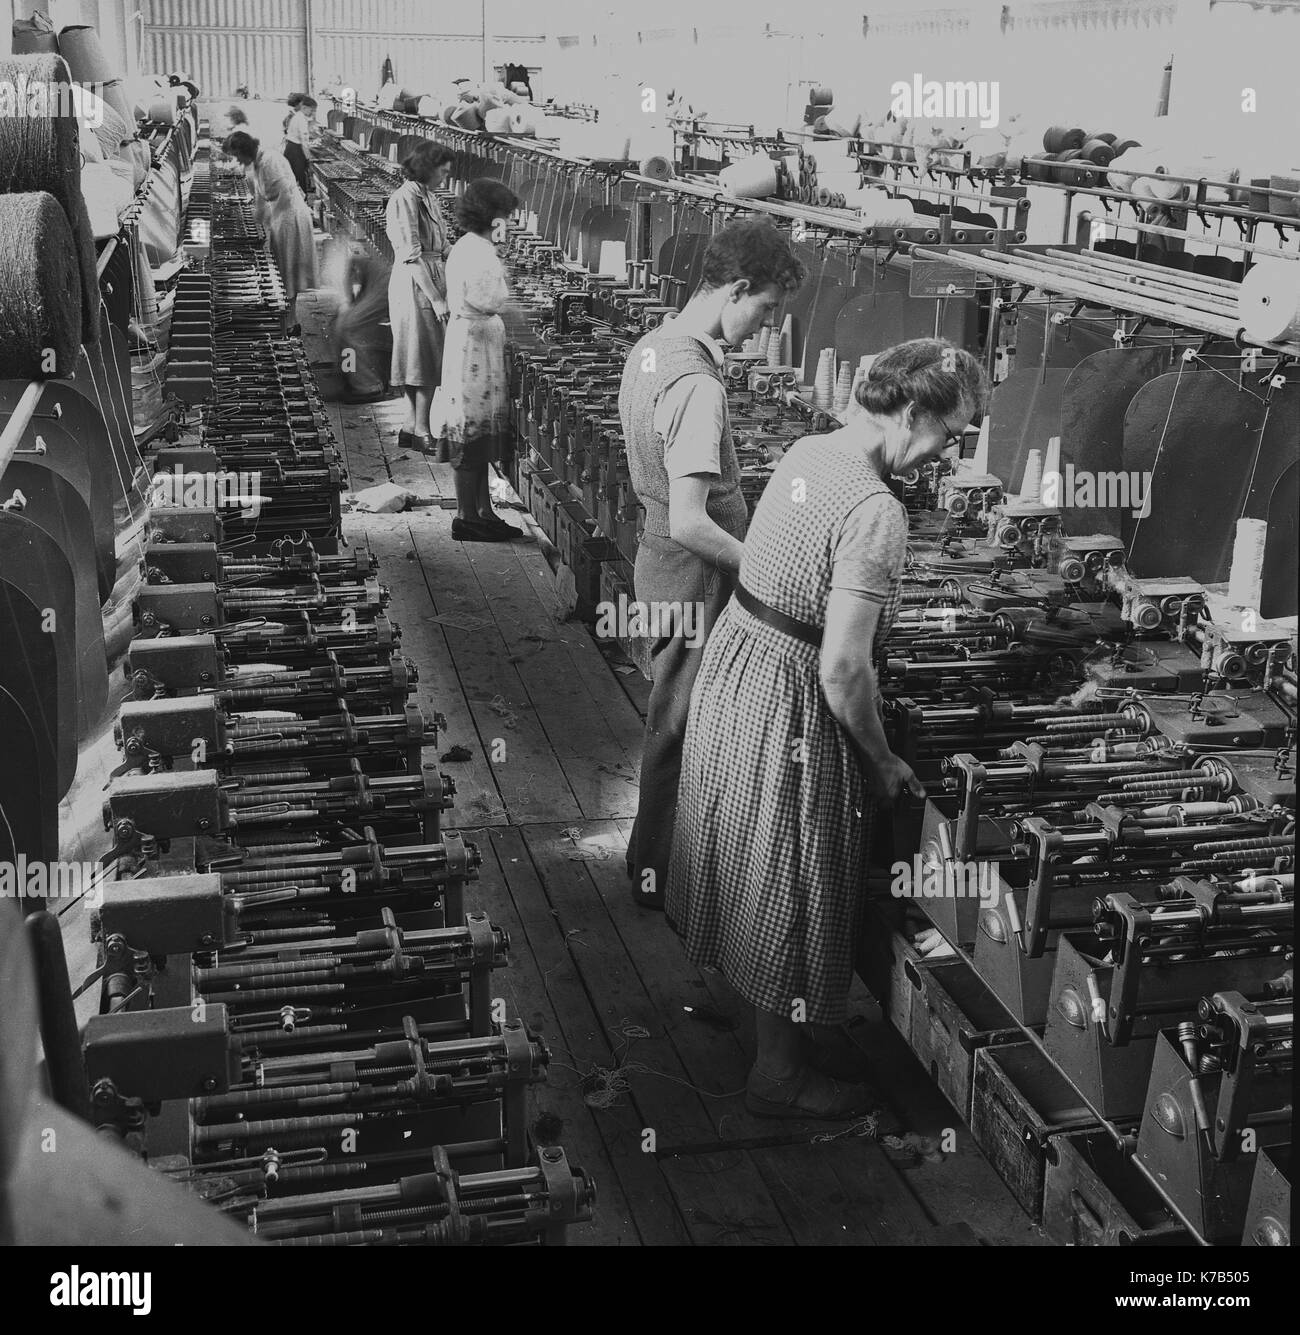 1950s, historical, Irish weavers, female workers standing on wooden floorboards using mechanised linen looms, Northern Ireland. - Stock Image